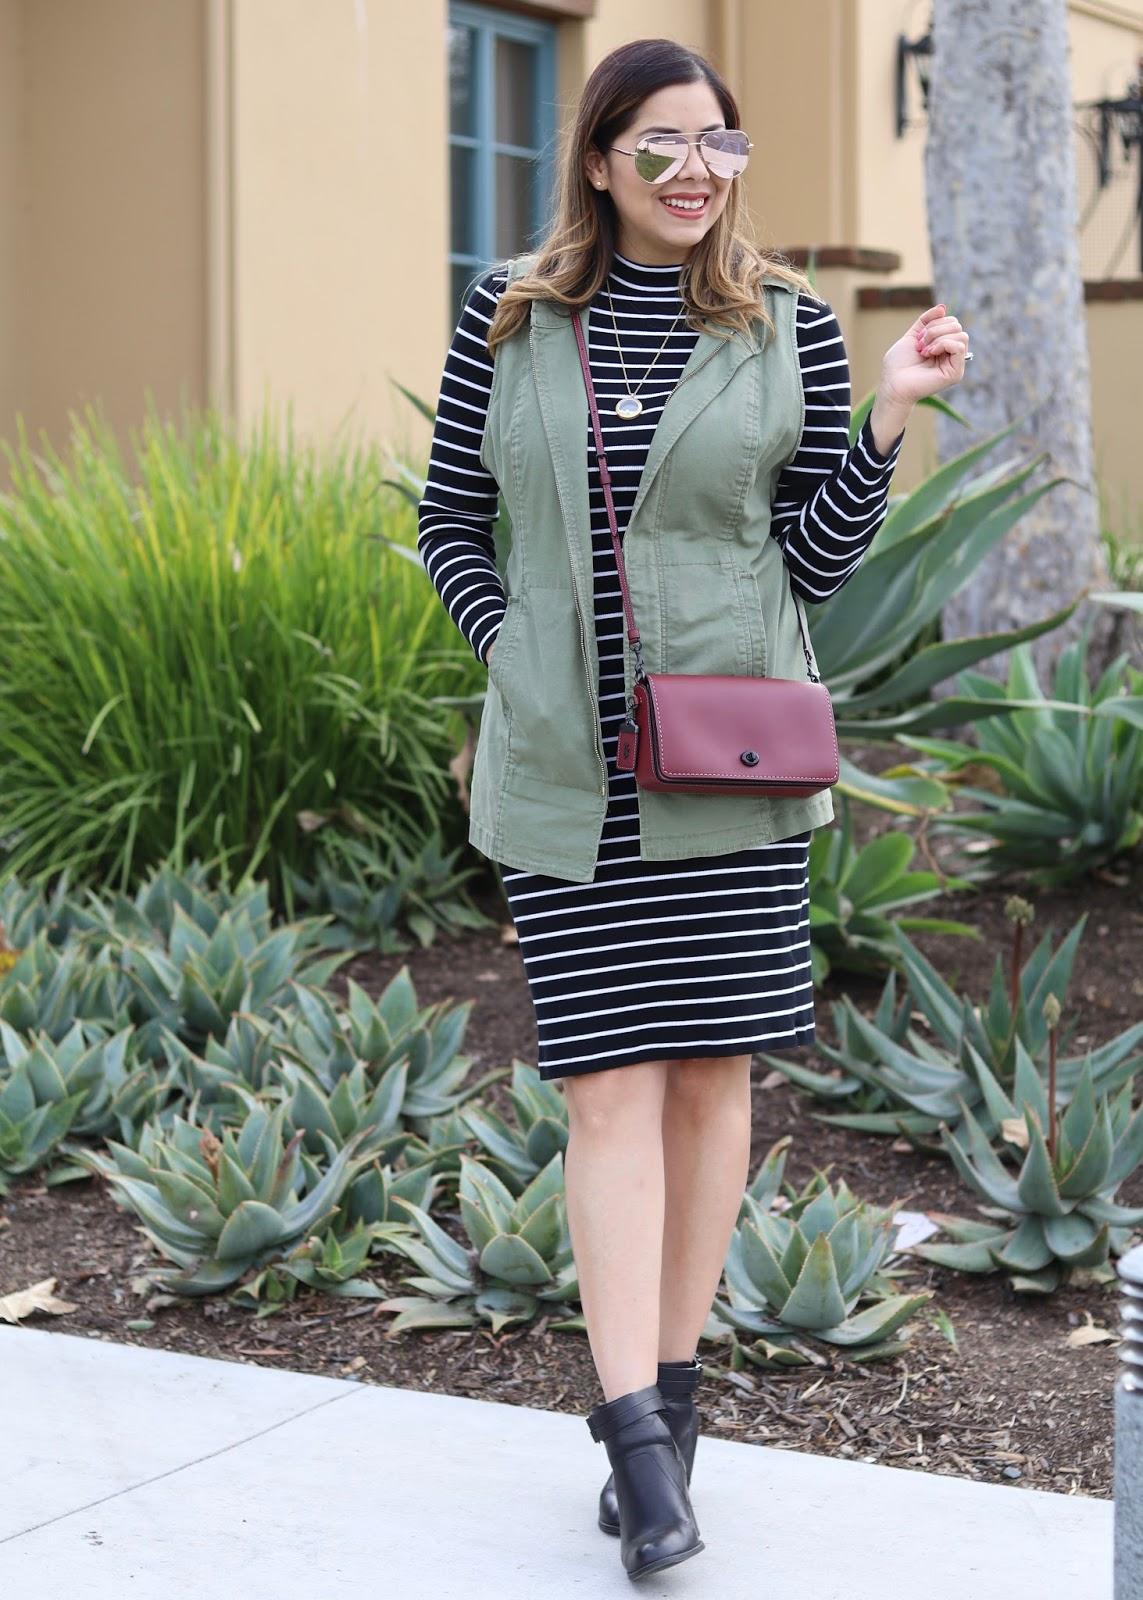 how to wear a striped midi dress, utility vest outfit idea, quay high key sunglasses